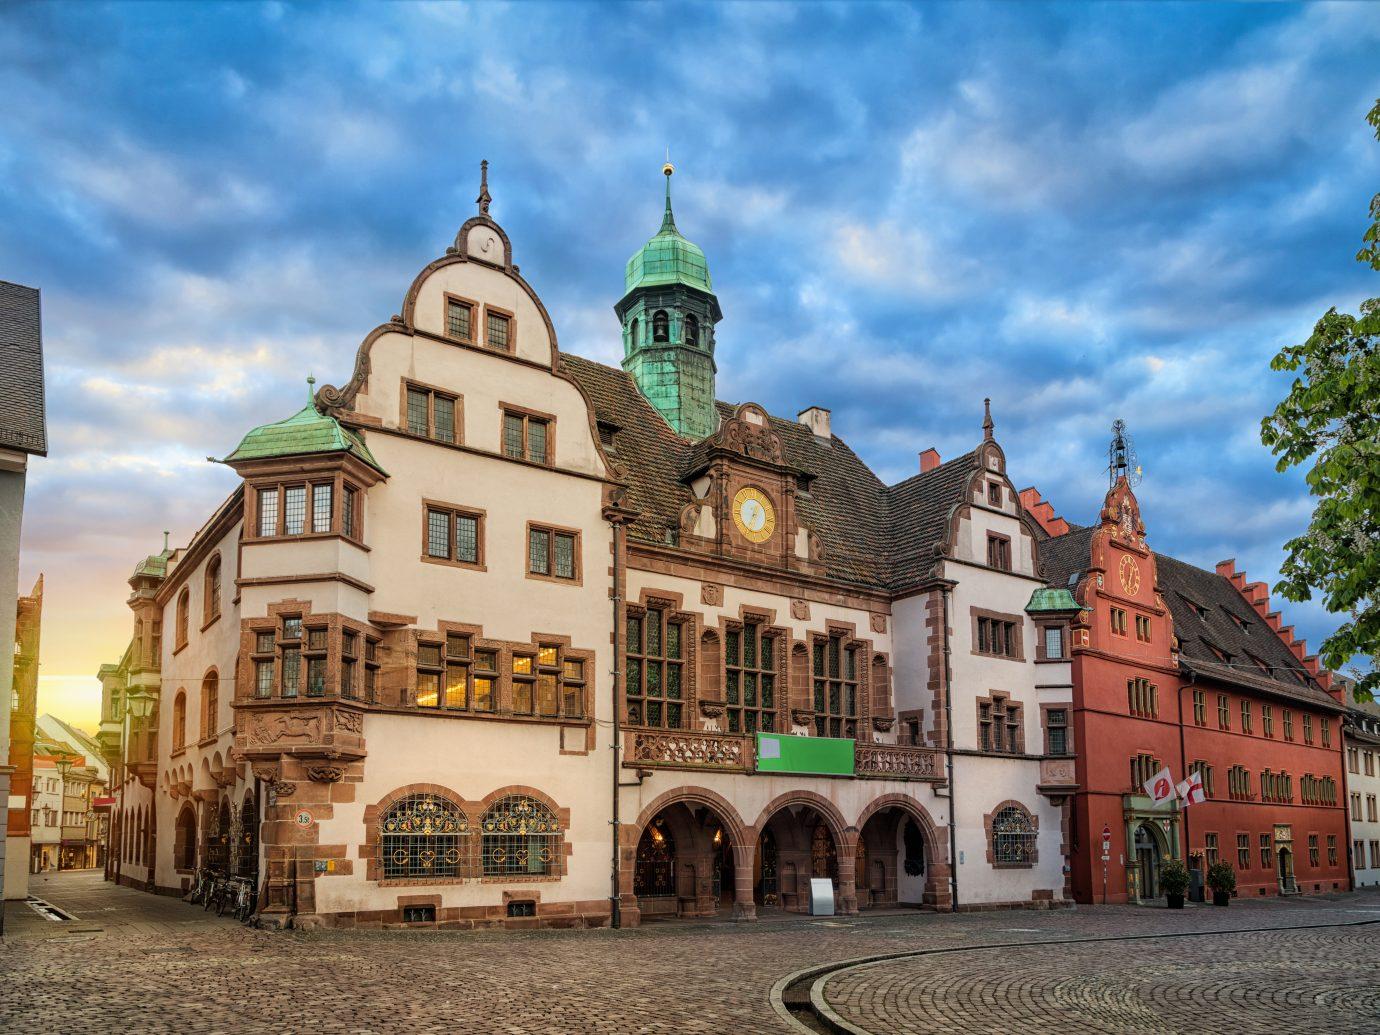 Old Town Hall (Altes Rathaus) on sunrise in Freiburg im Breisgau, Baden-Wurttemberg, Germany